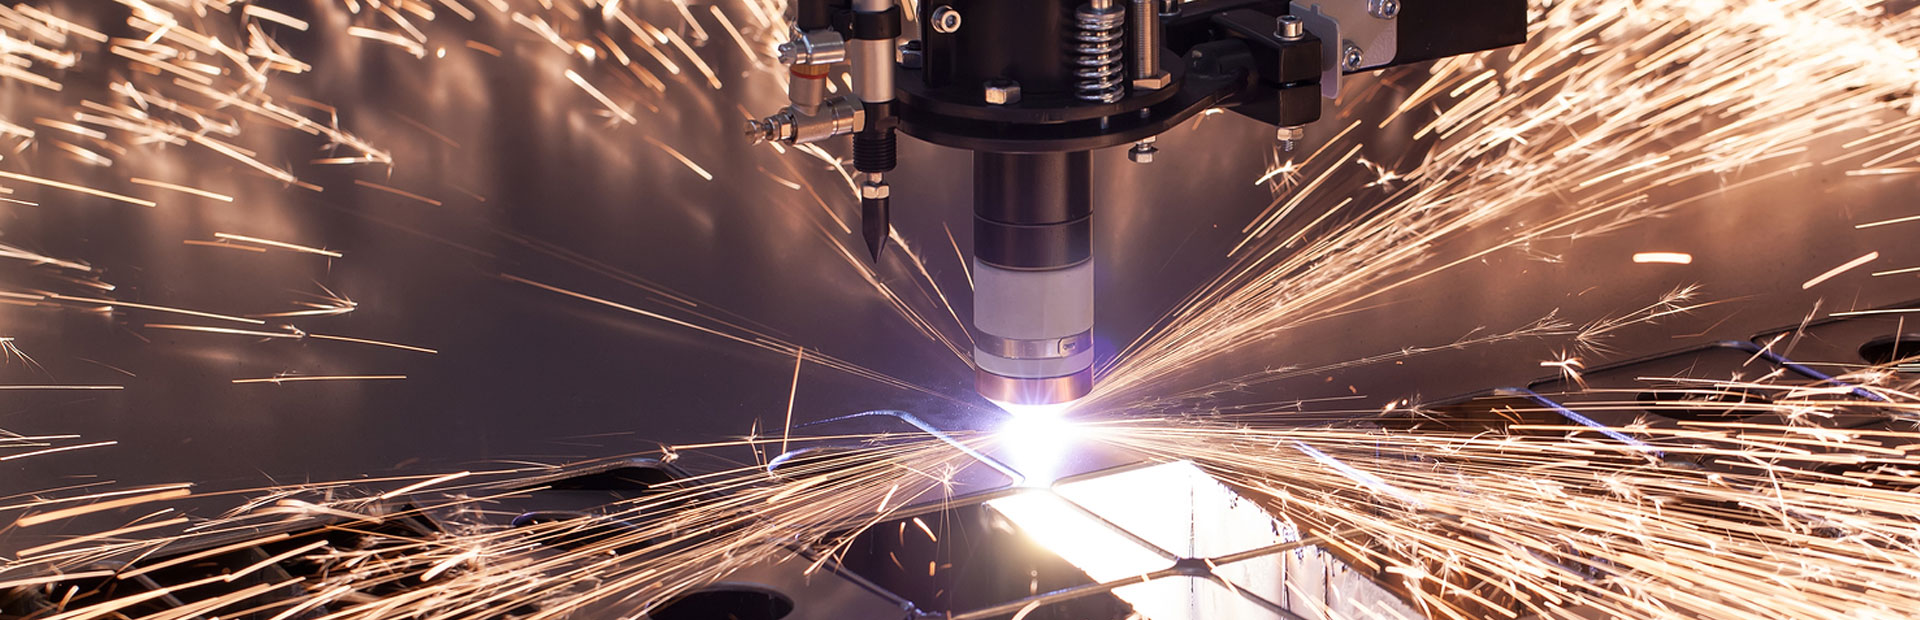 Preision plasma welding